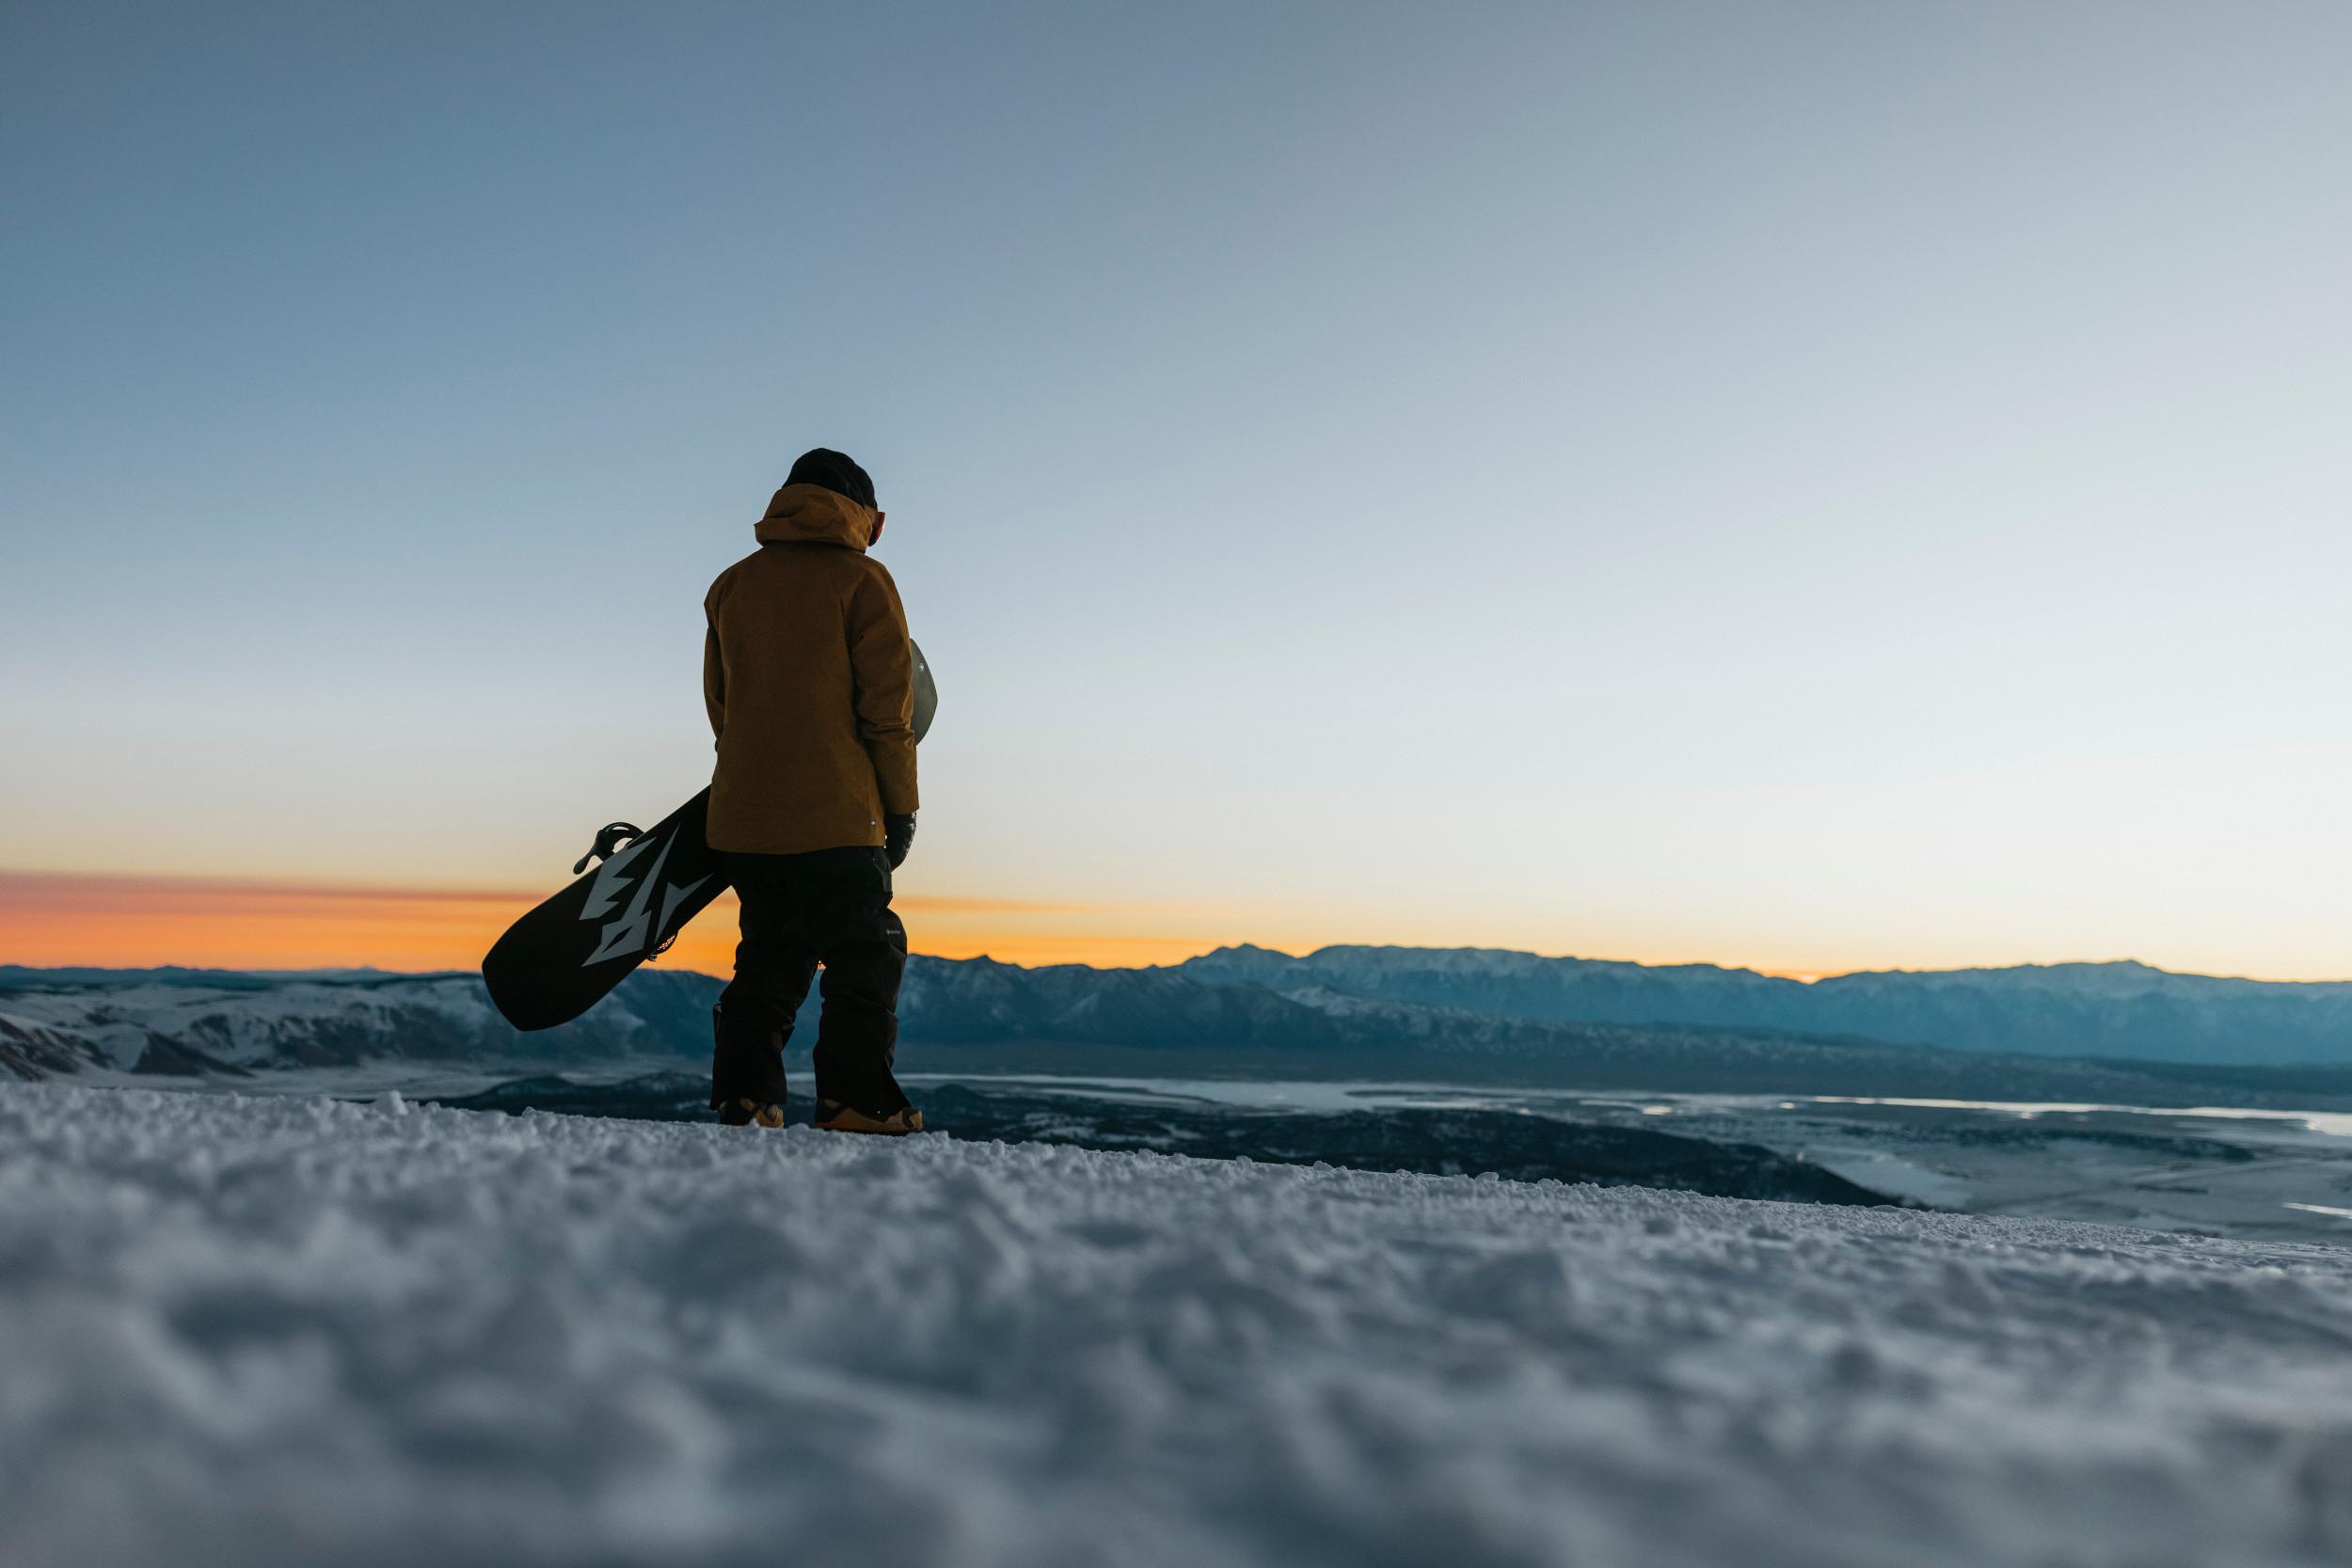 mammoth-mountain-snowboarding